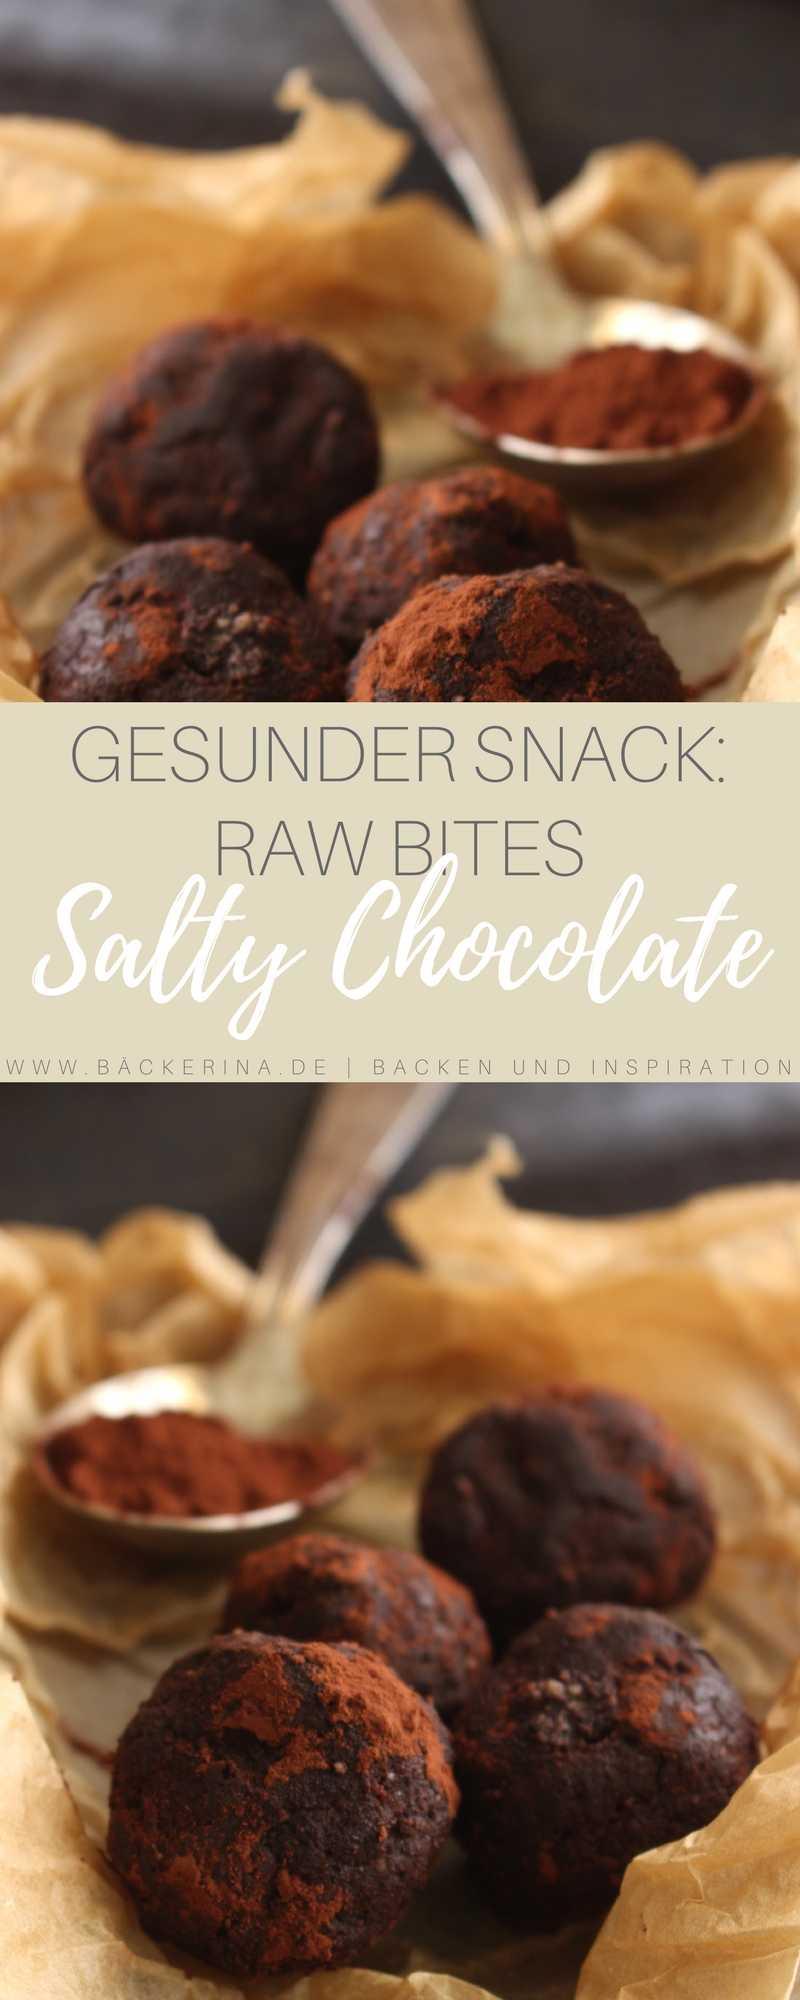 Raw Bites Salty Chocolate